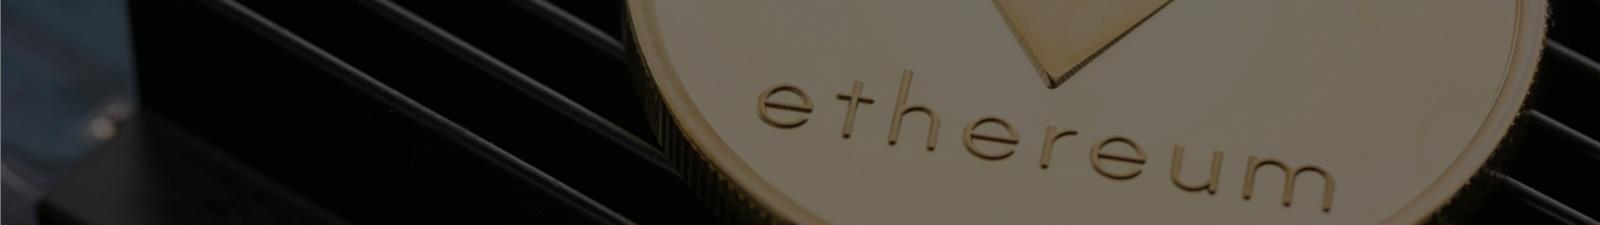 ethereum-blockchain-webinarlp-banner.jpg